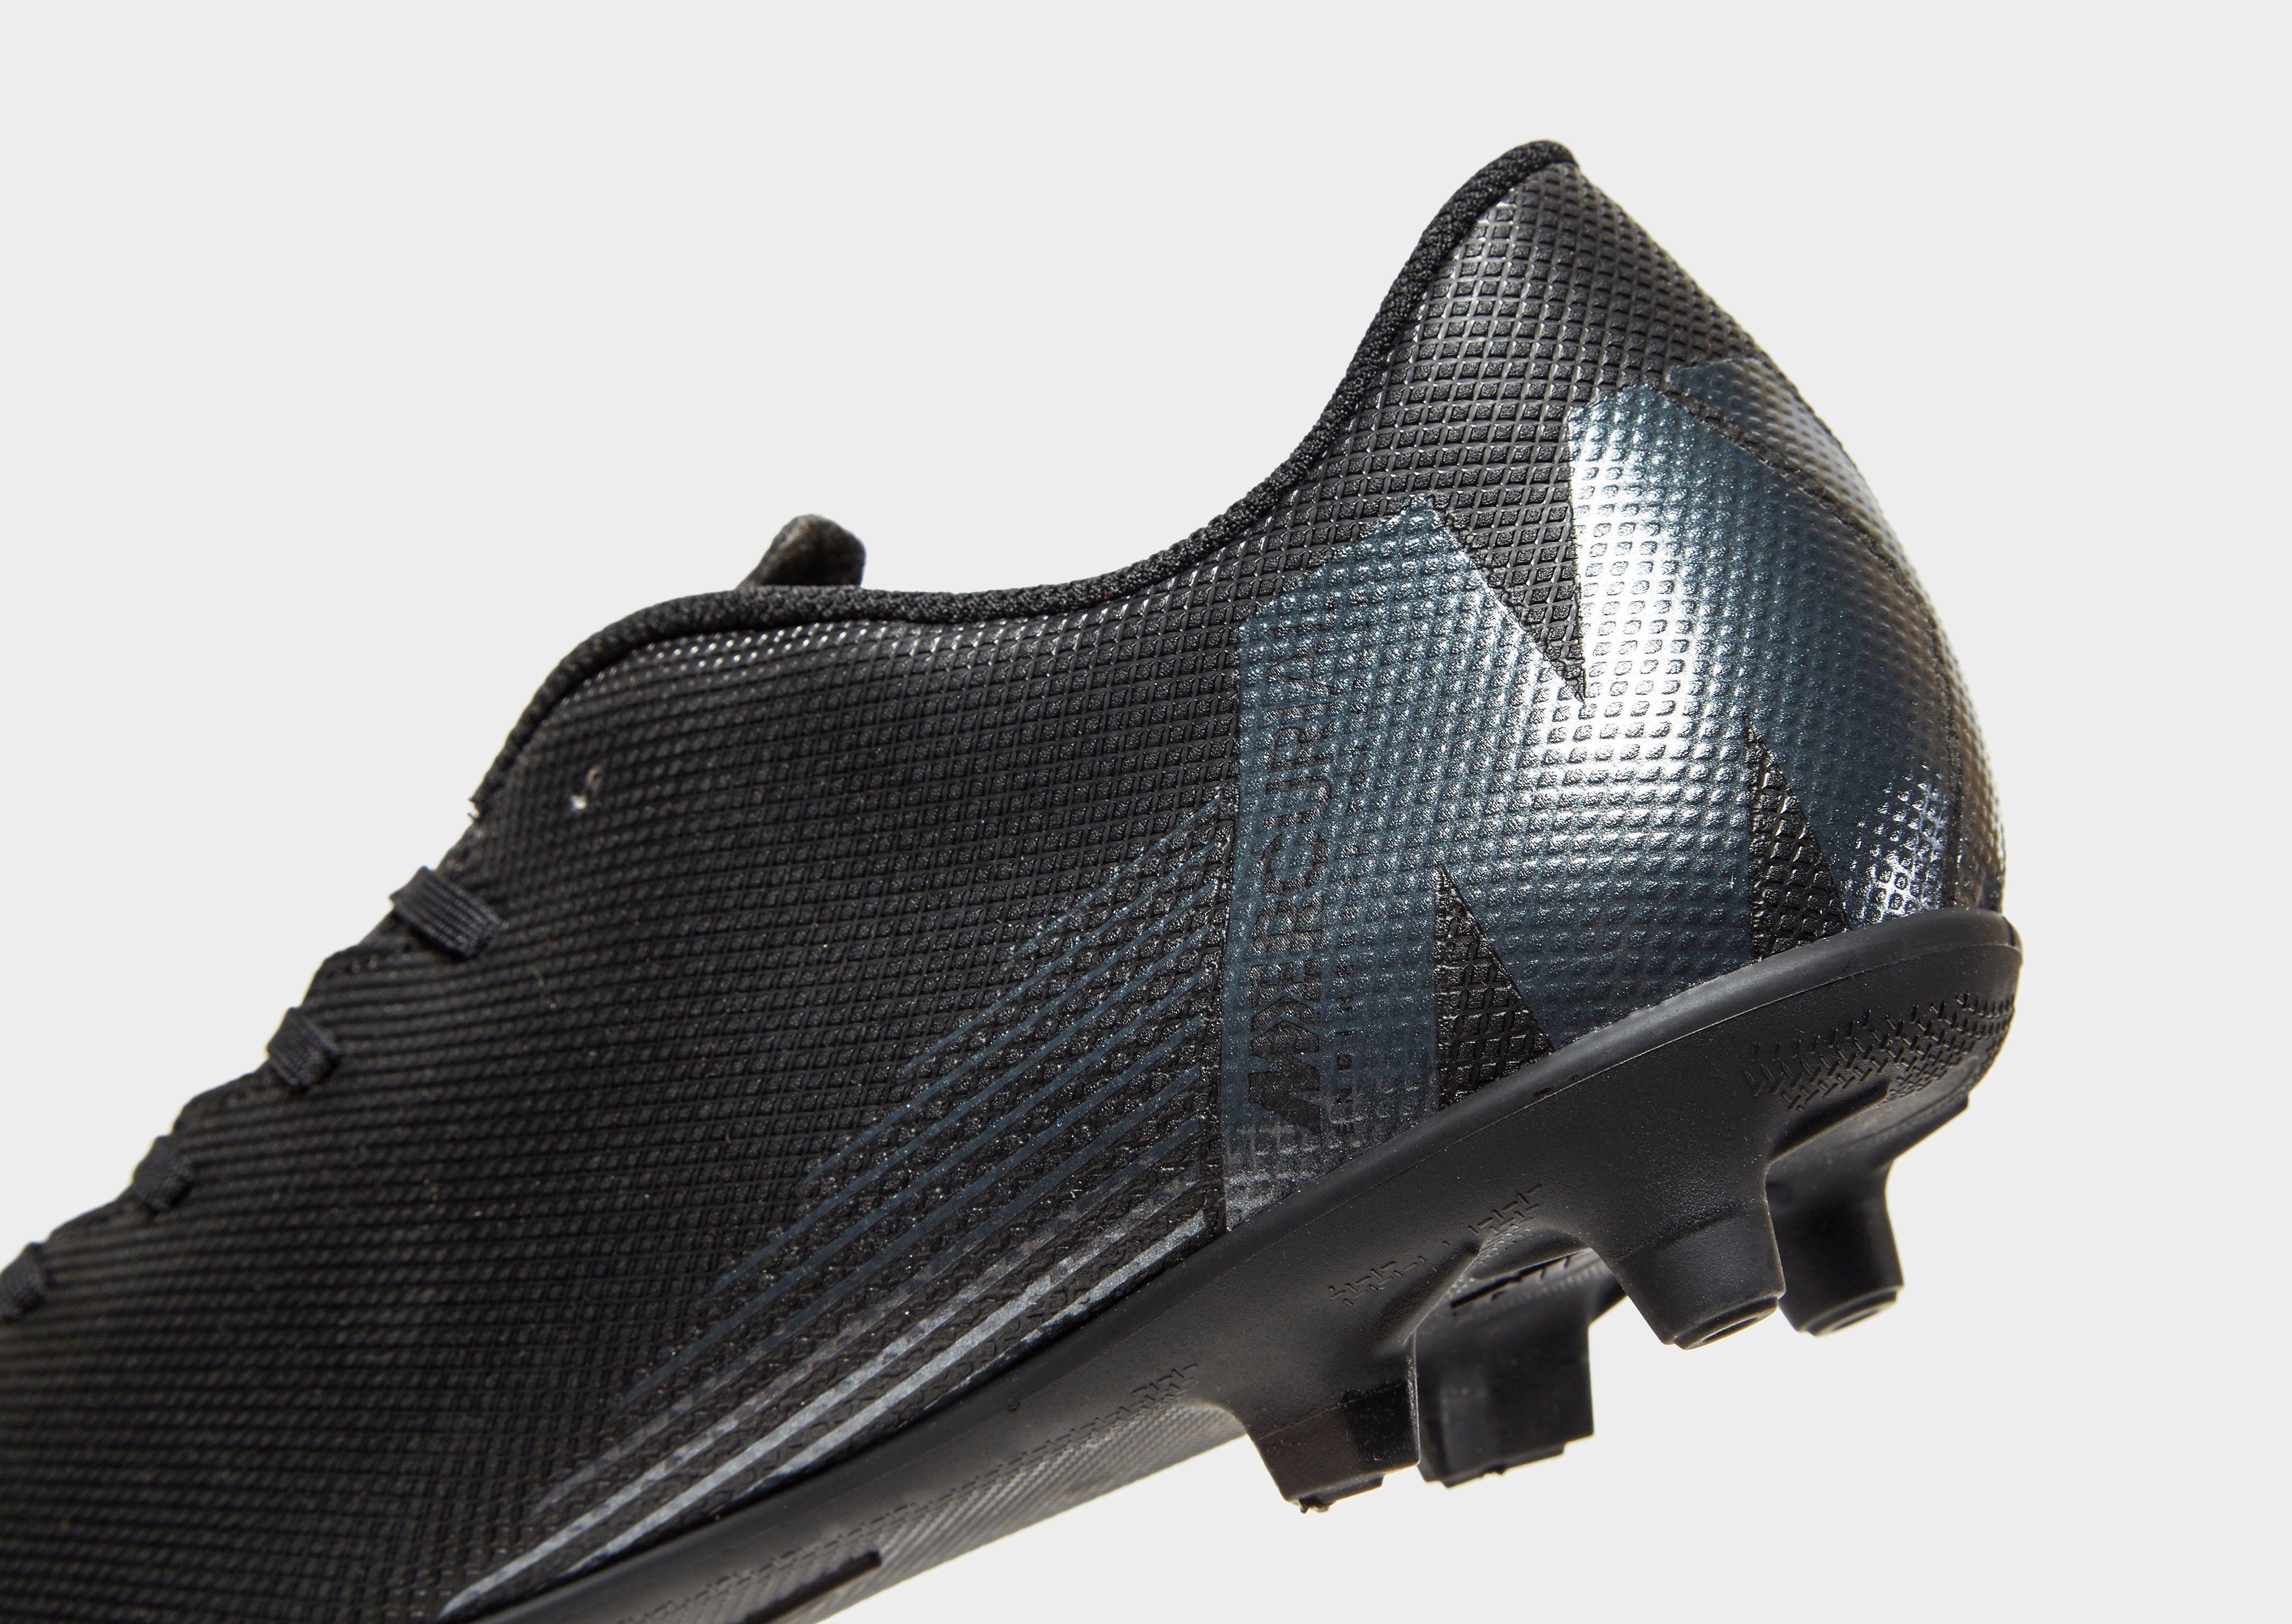 Nike Stealth Ops Mercurial Vapor Club FG